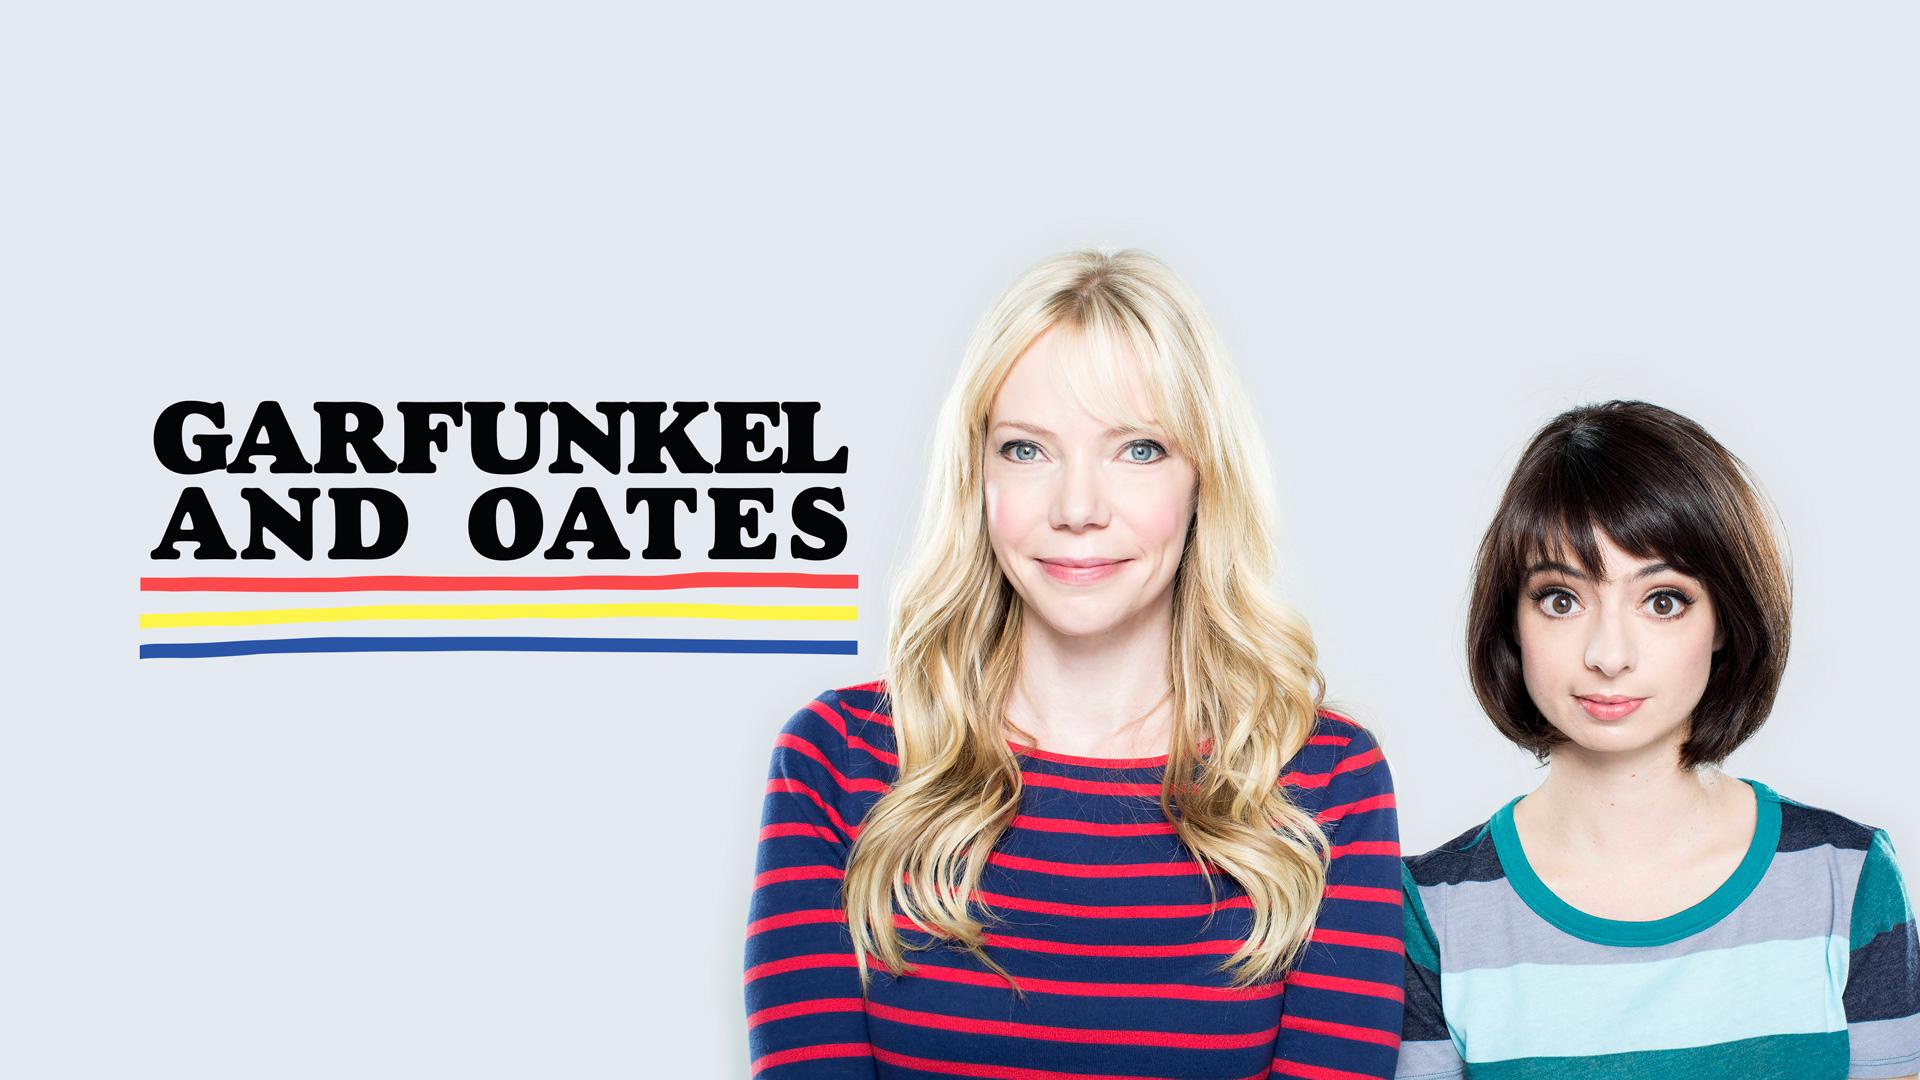 Garfunkel and Oates Season 1